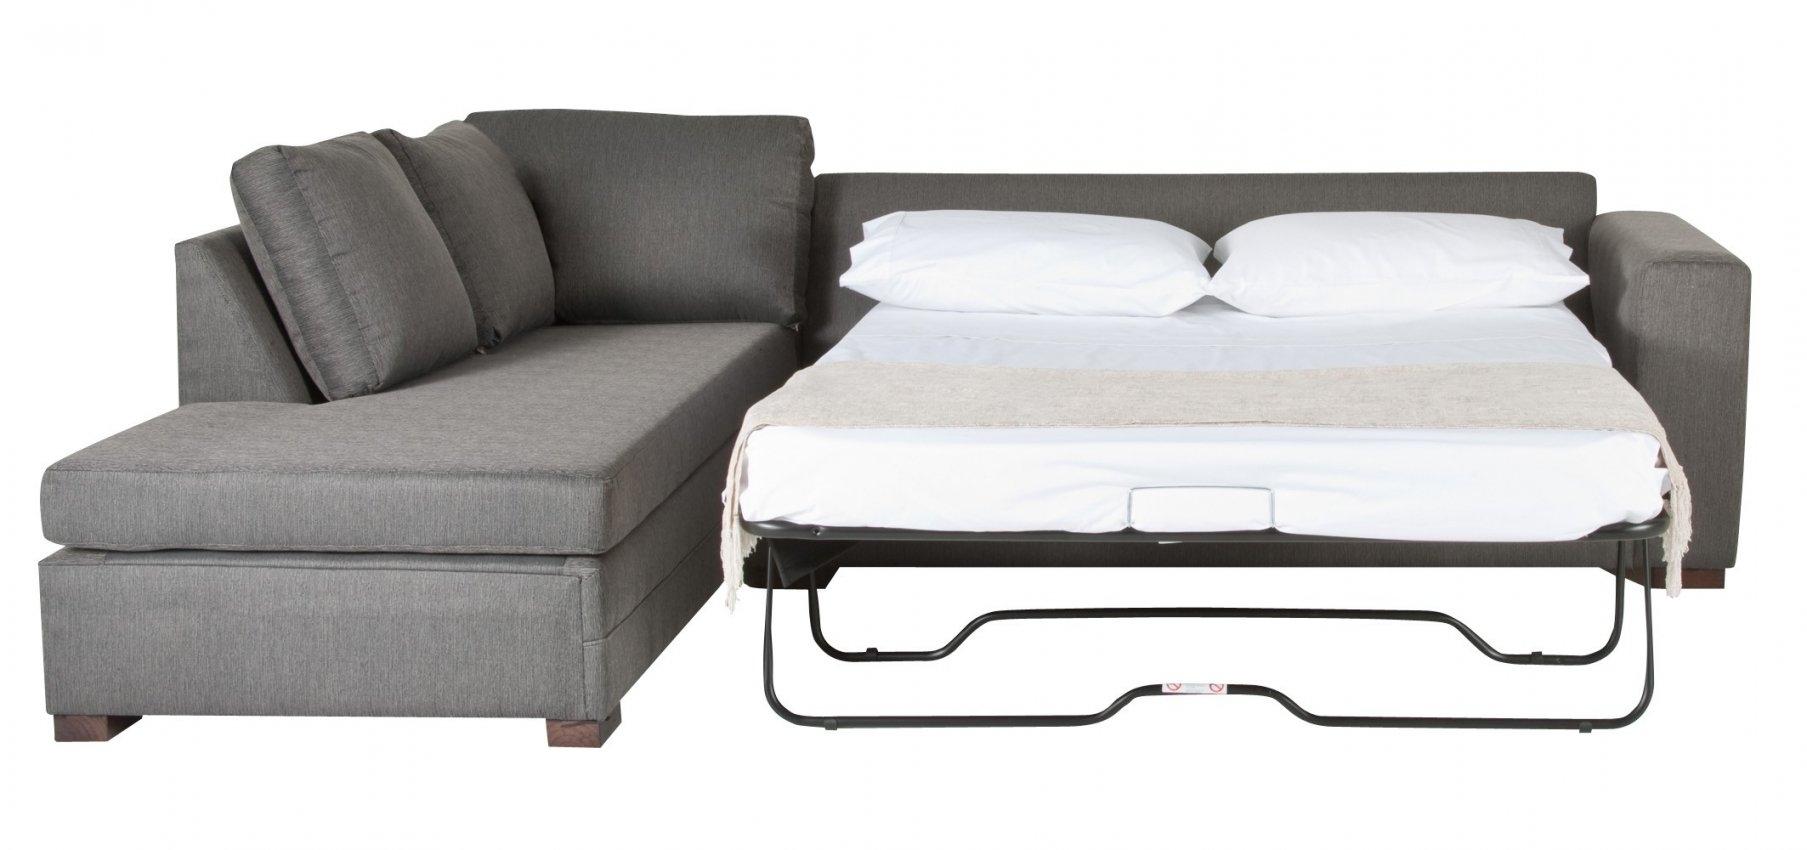 Sofa Design: Elegant L Shaped Sectional Sleeper Sofa L Inside In L Shaped Sectional Sleeper Sofas (View 2 of 10)